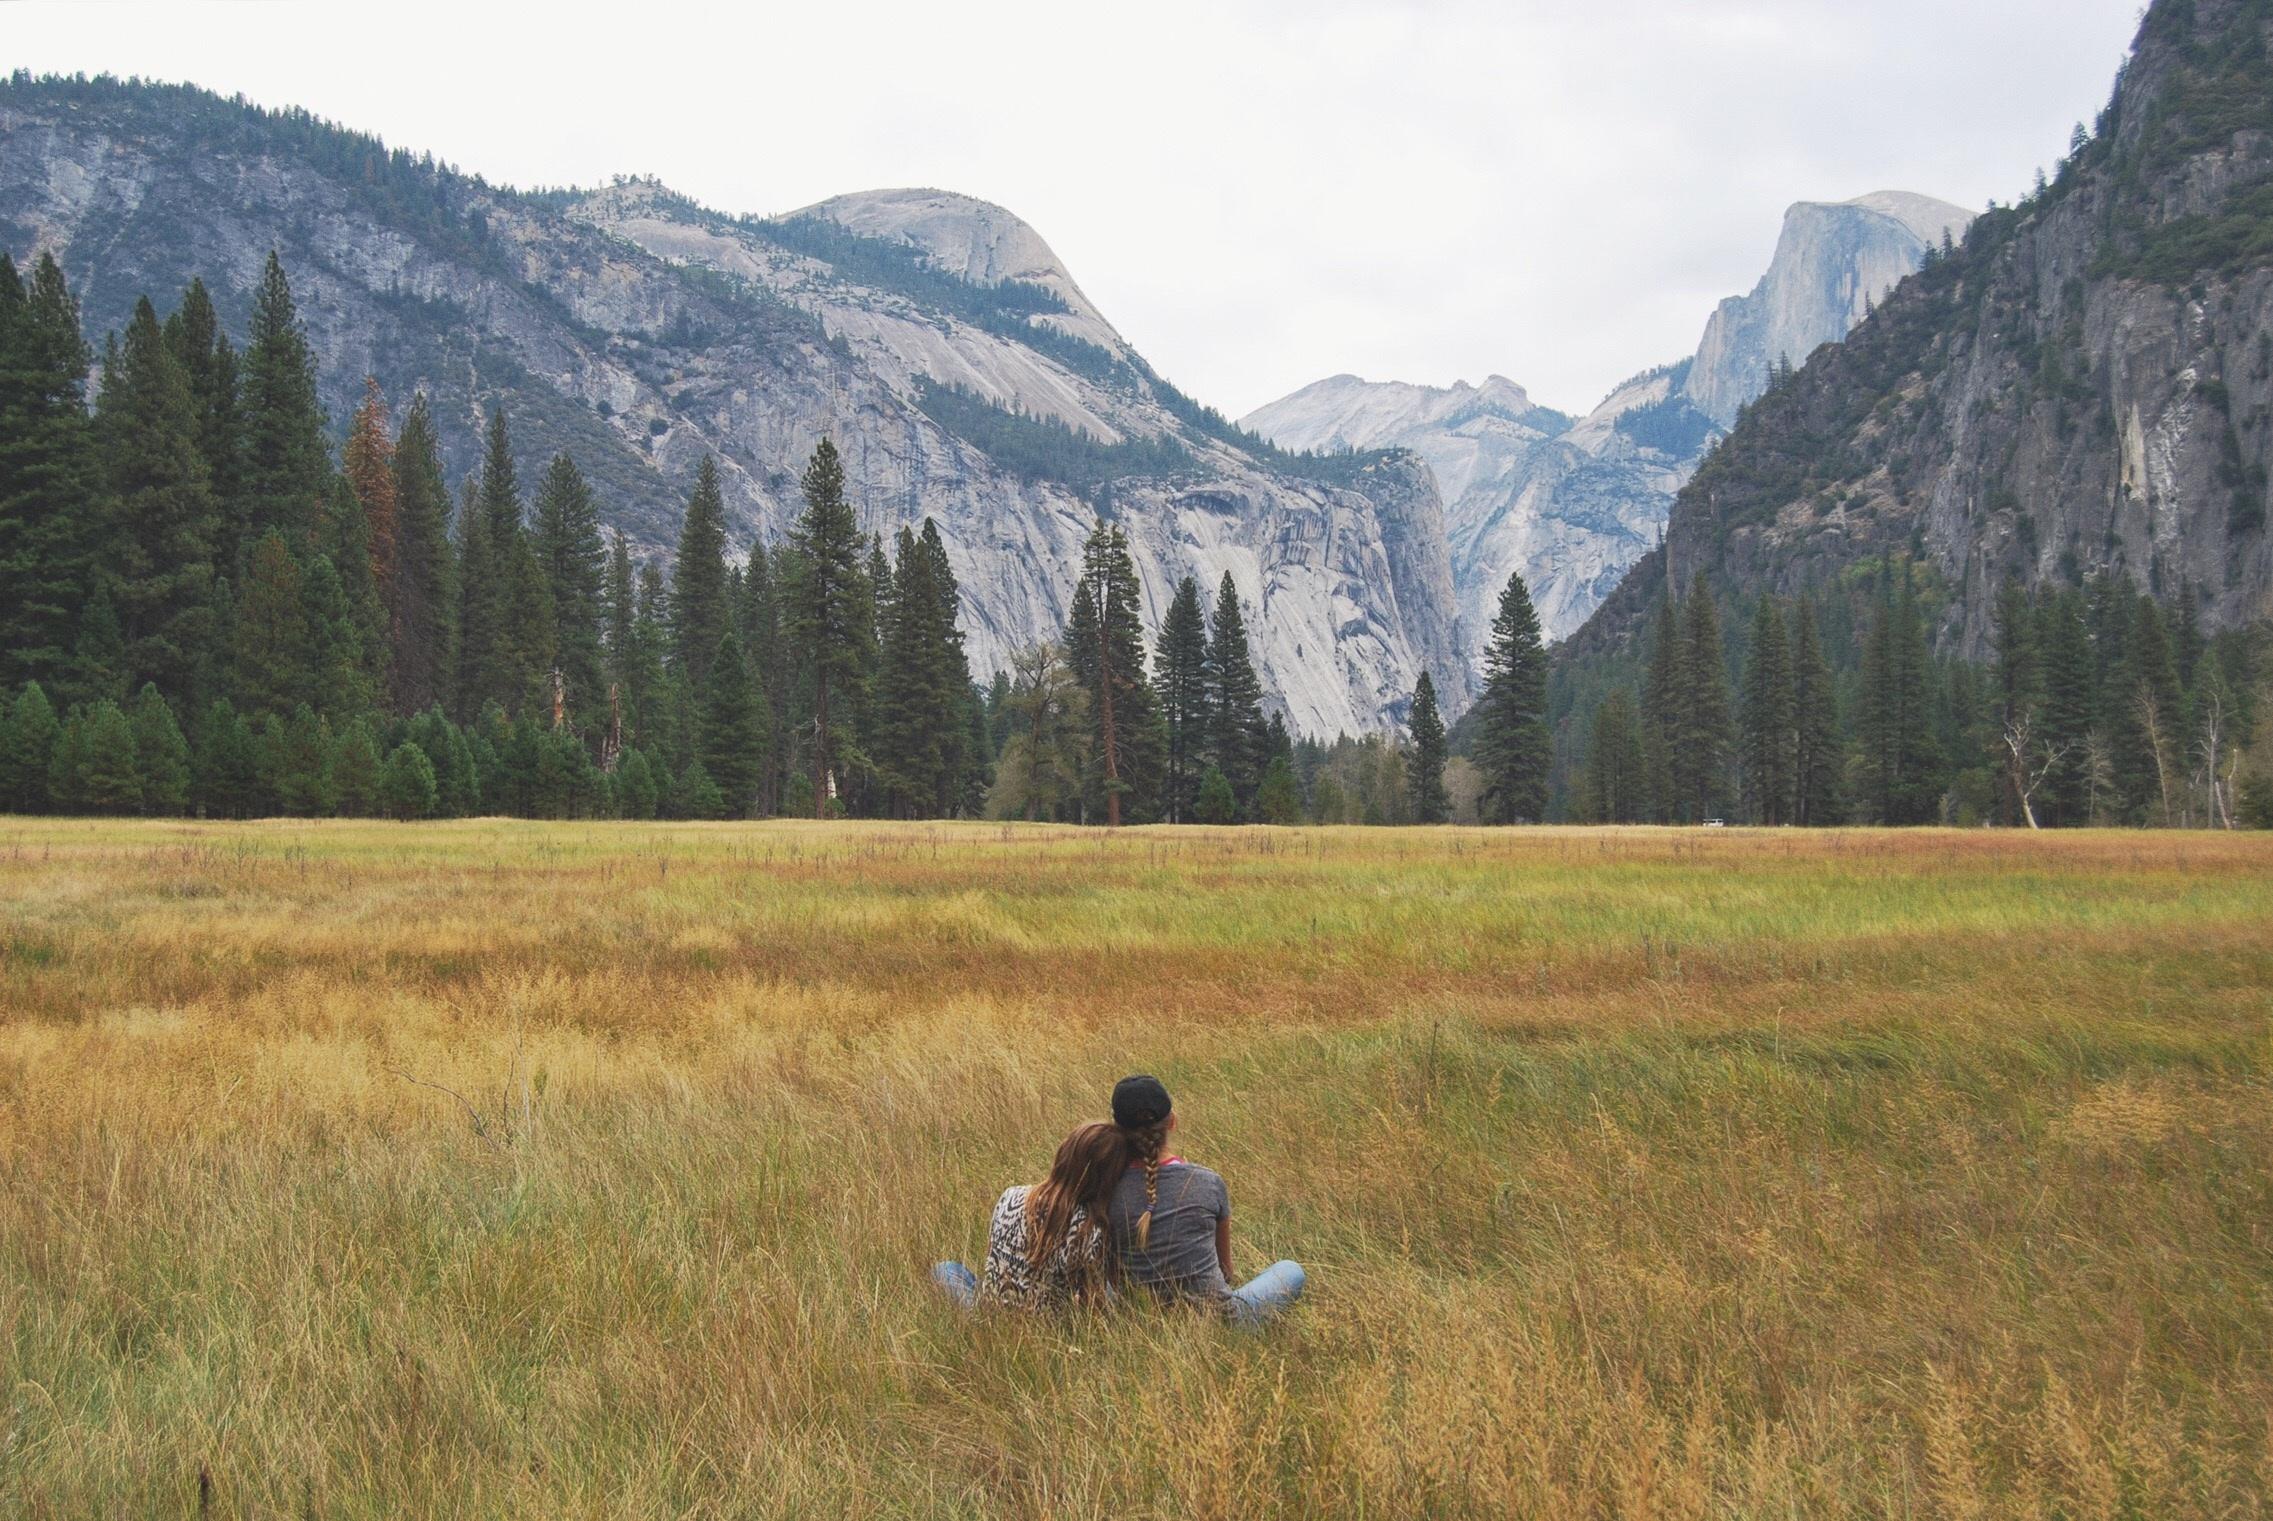 Seeking Treatment - Freedom From Addiction